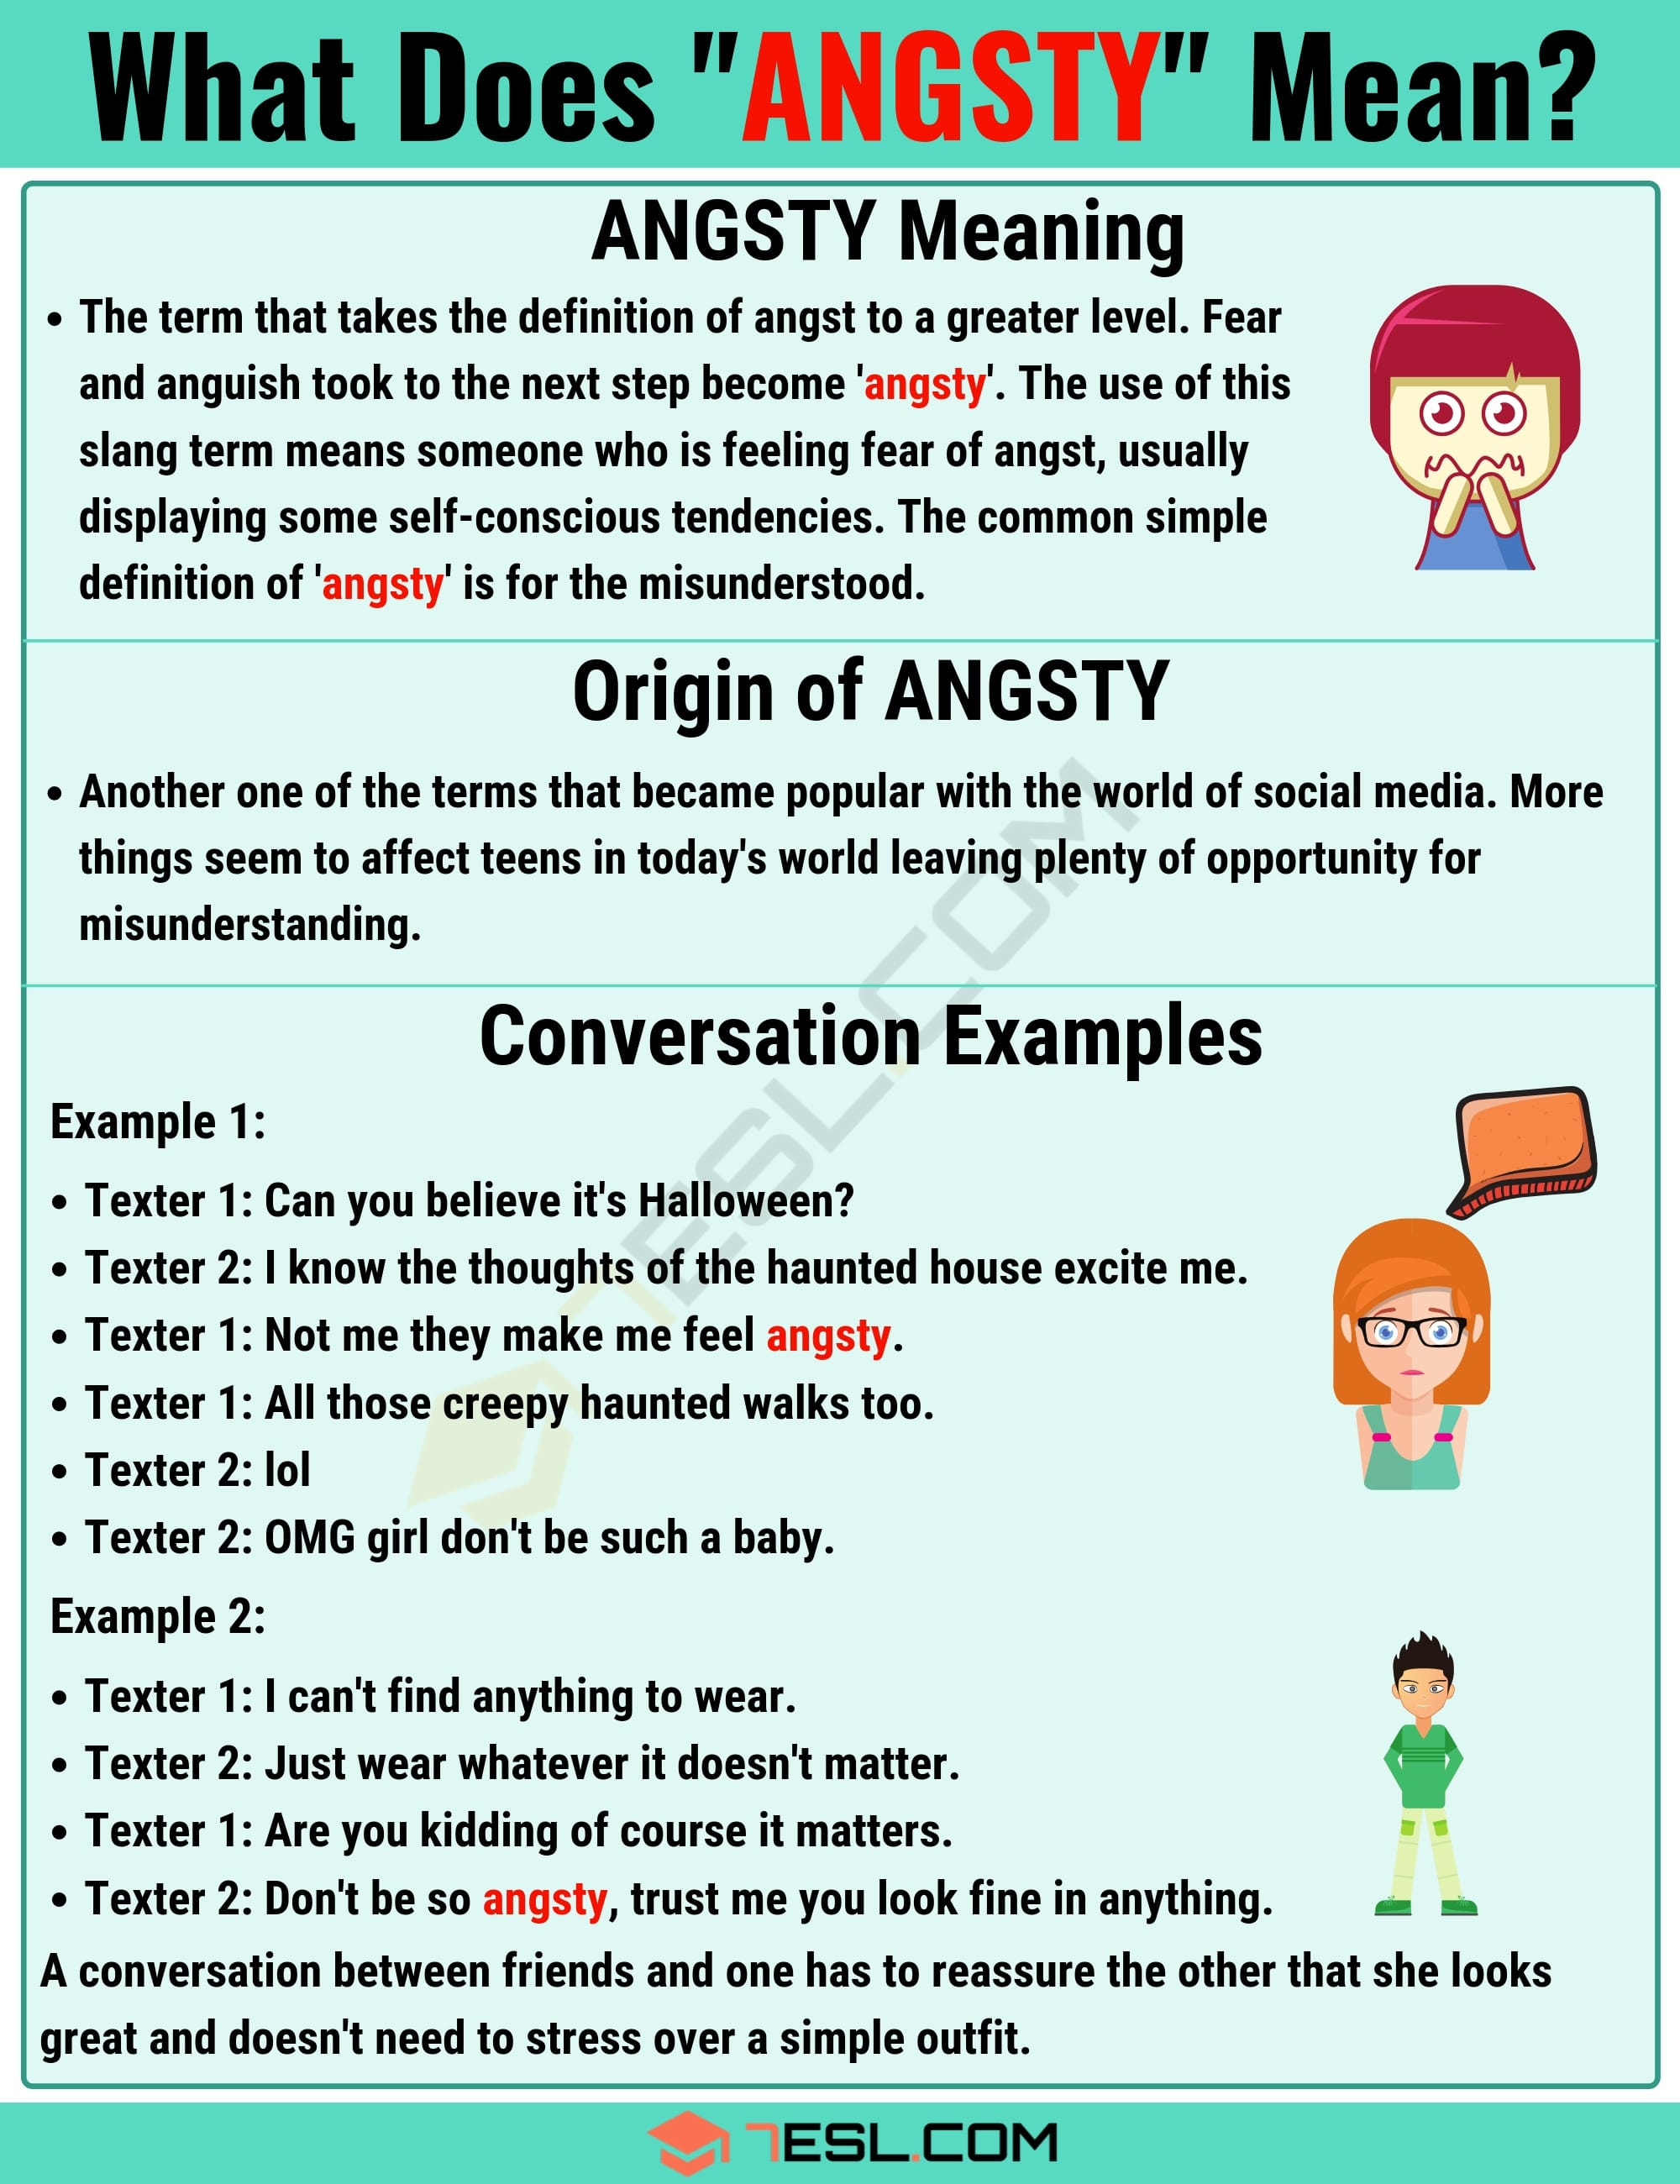 ANGSTY